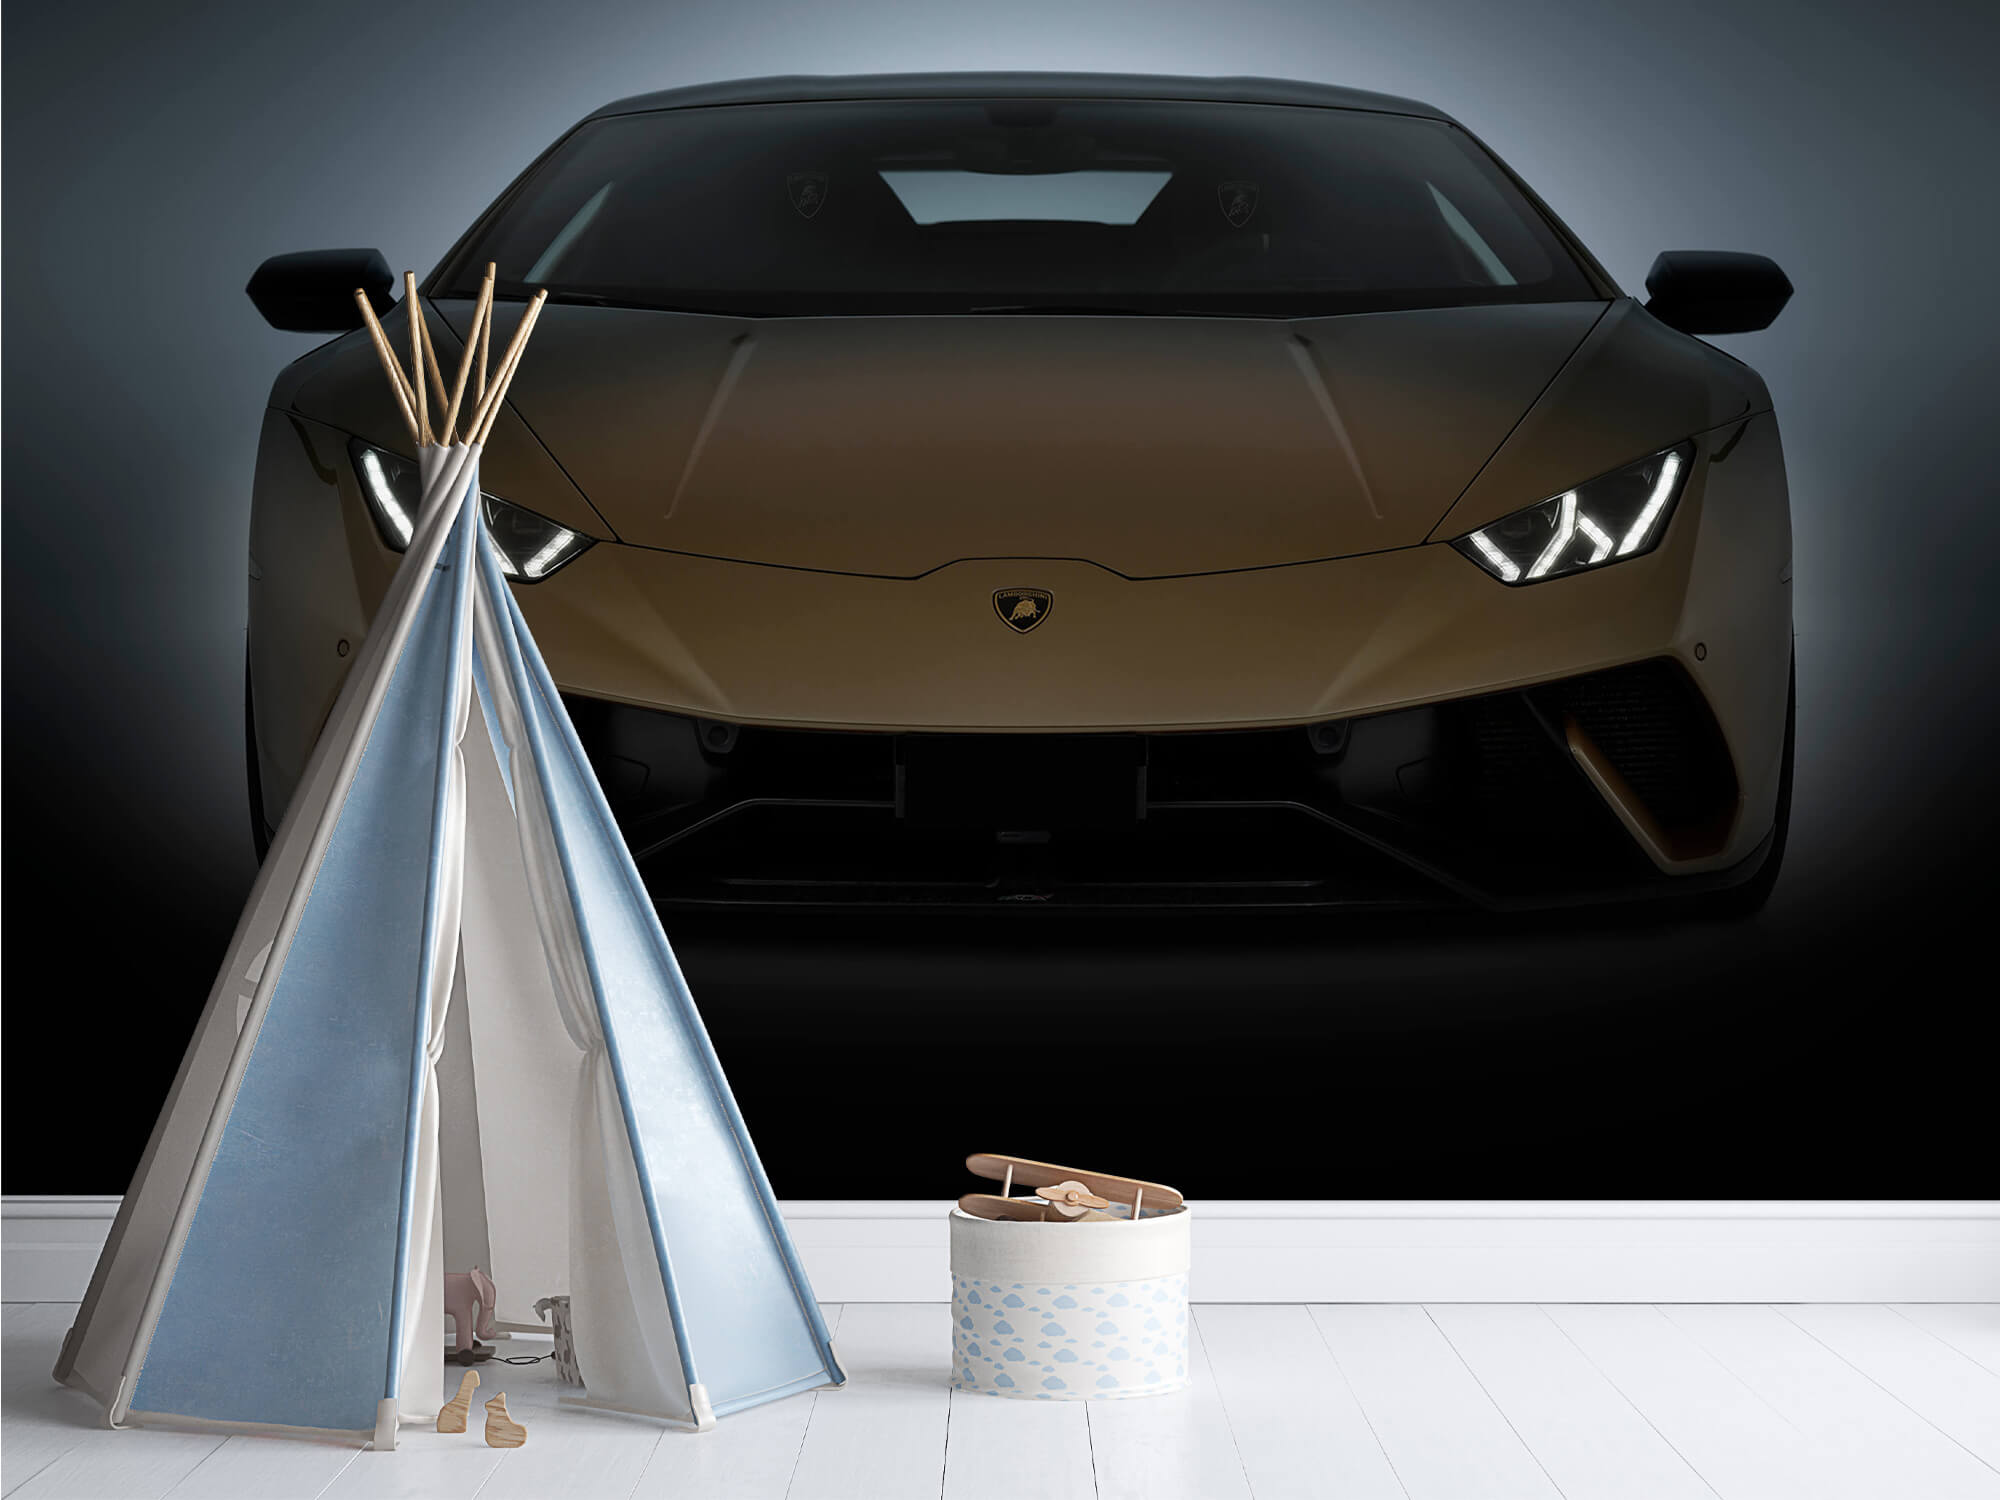 Wallpaper Lamborghini Huracán - Huracán - Fram 11